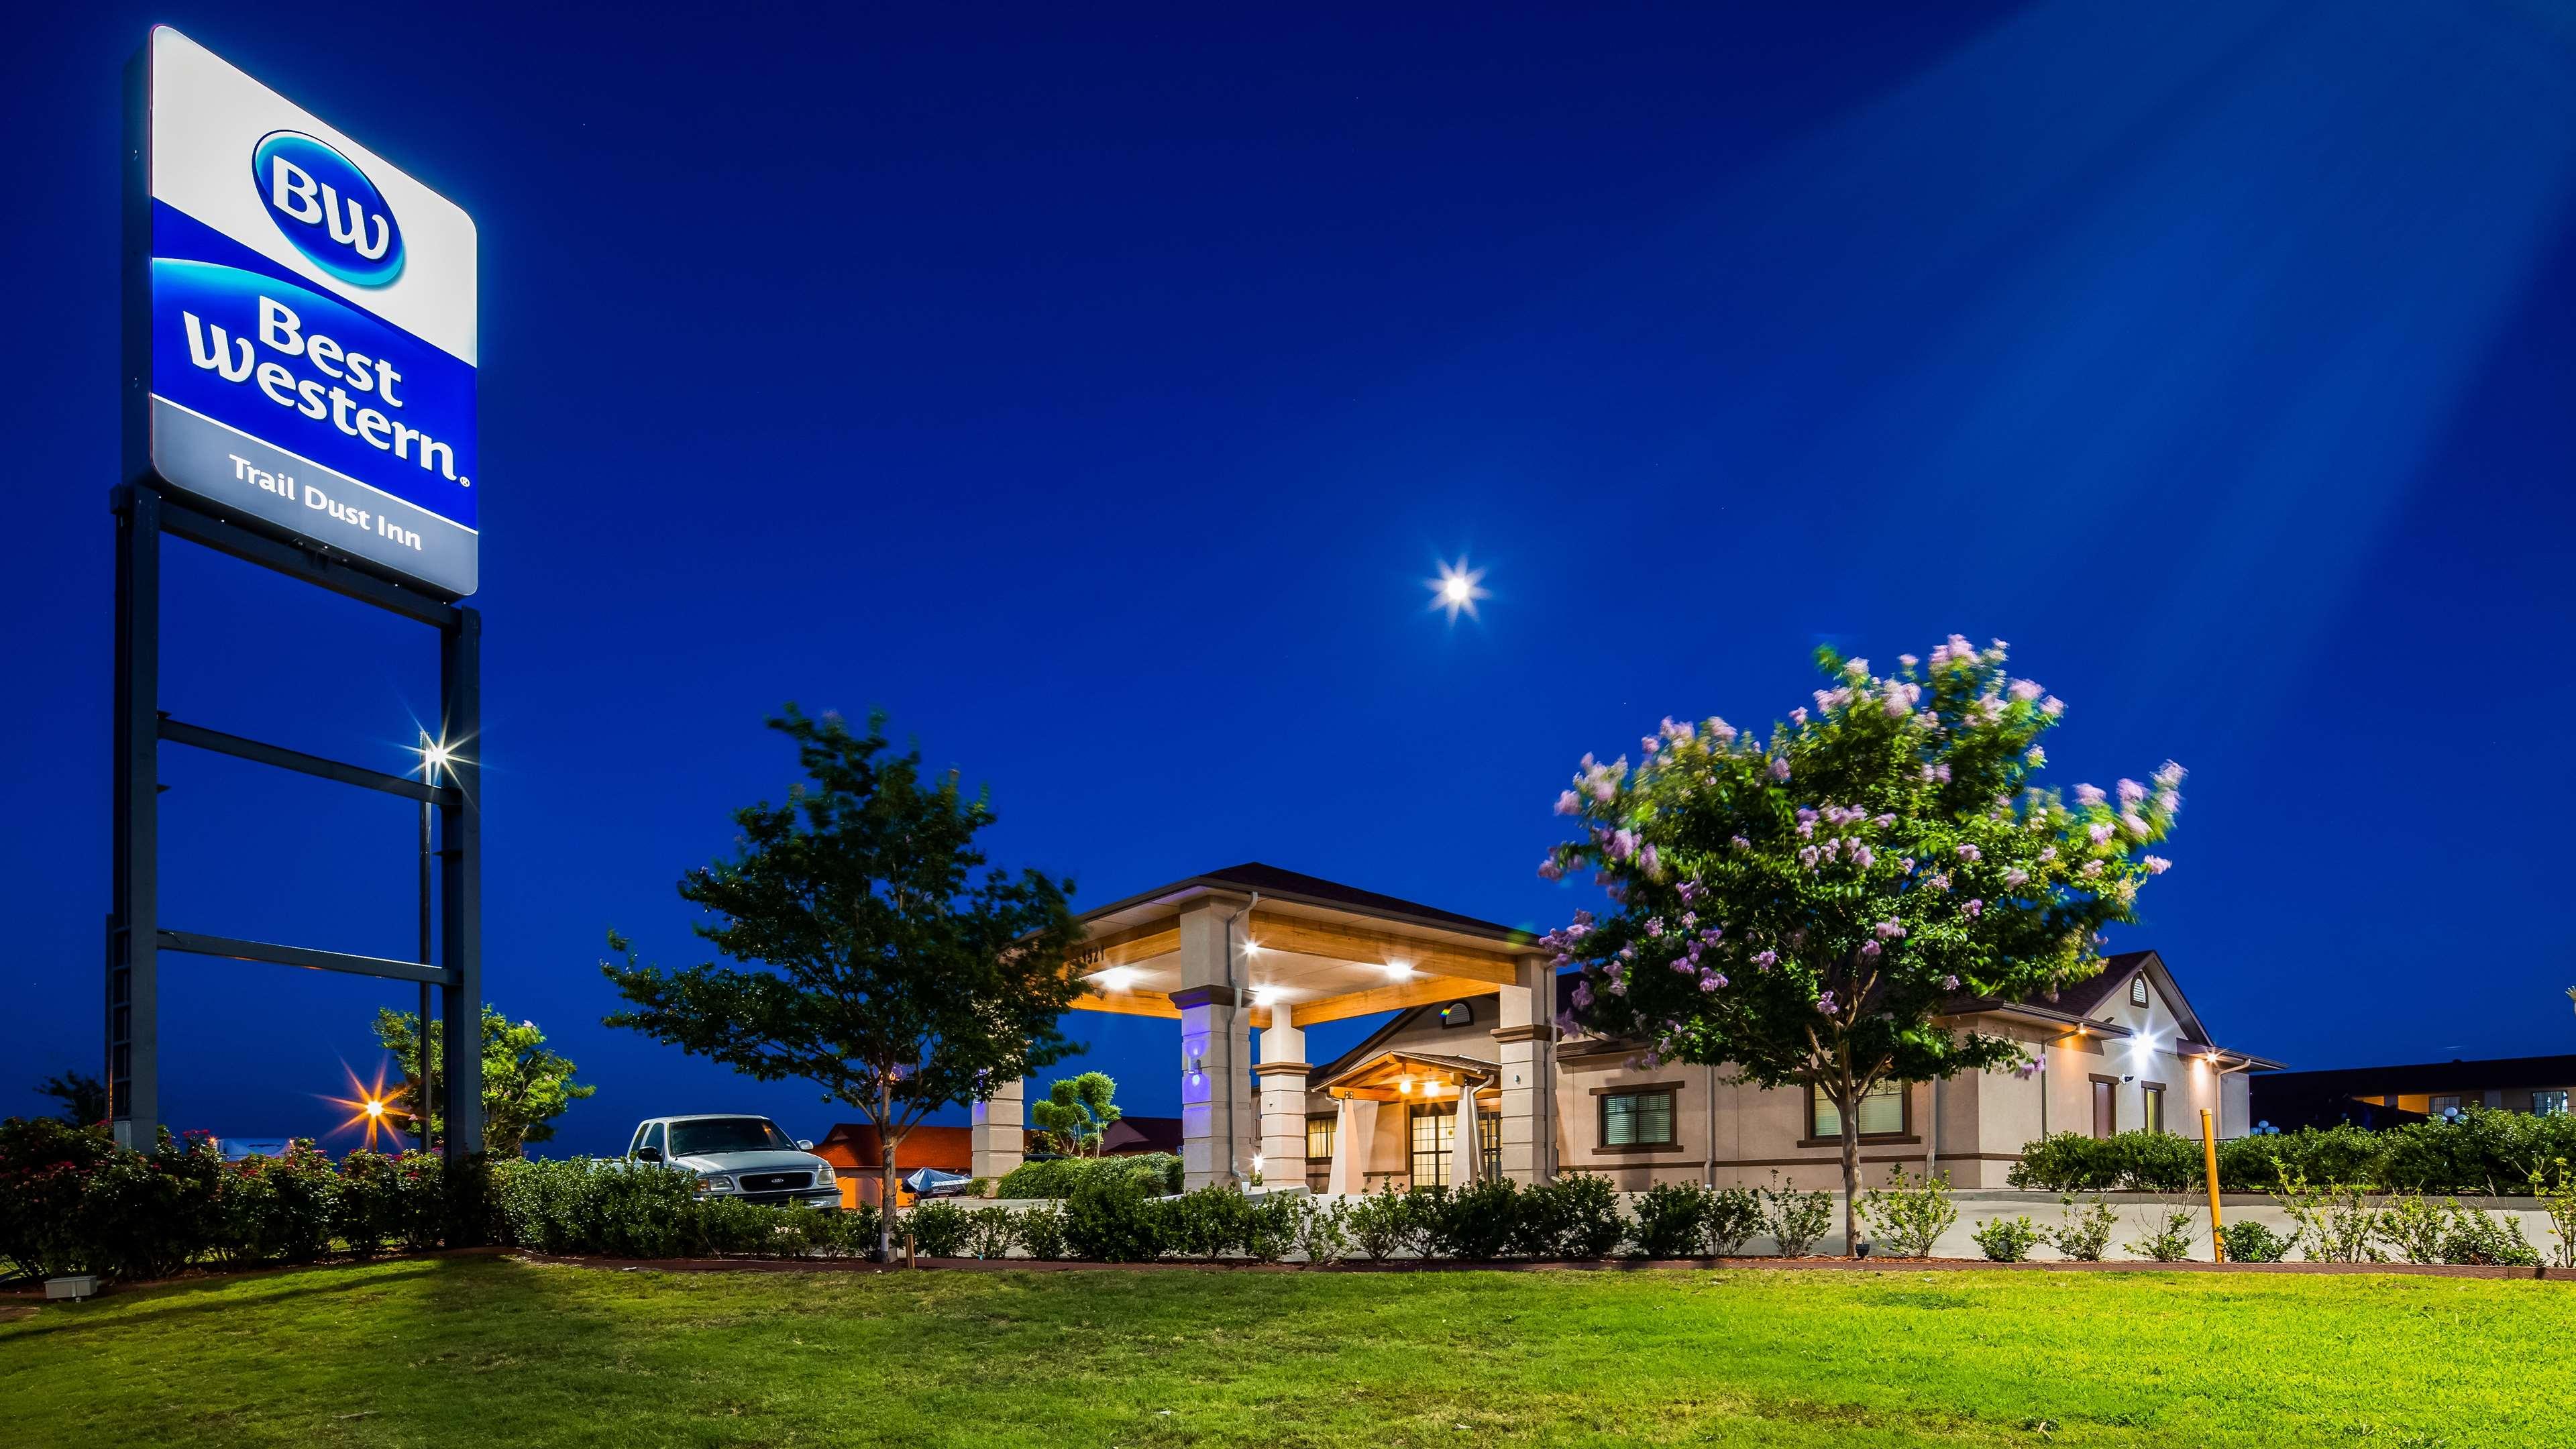 Best Western Trail Dust Inn & Suites image 11